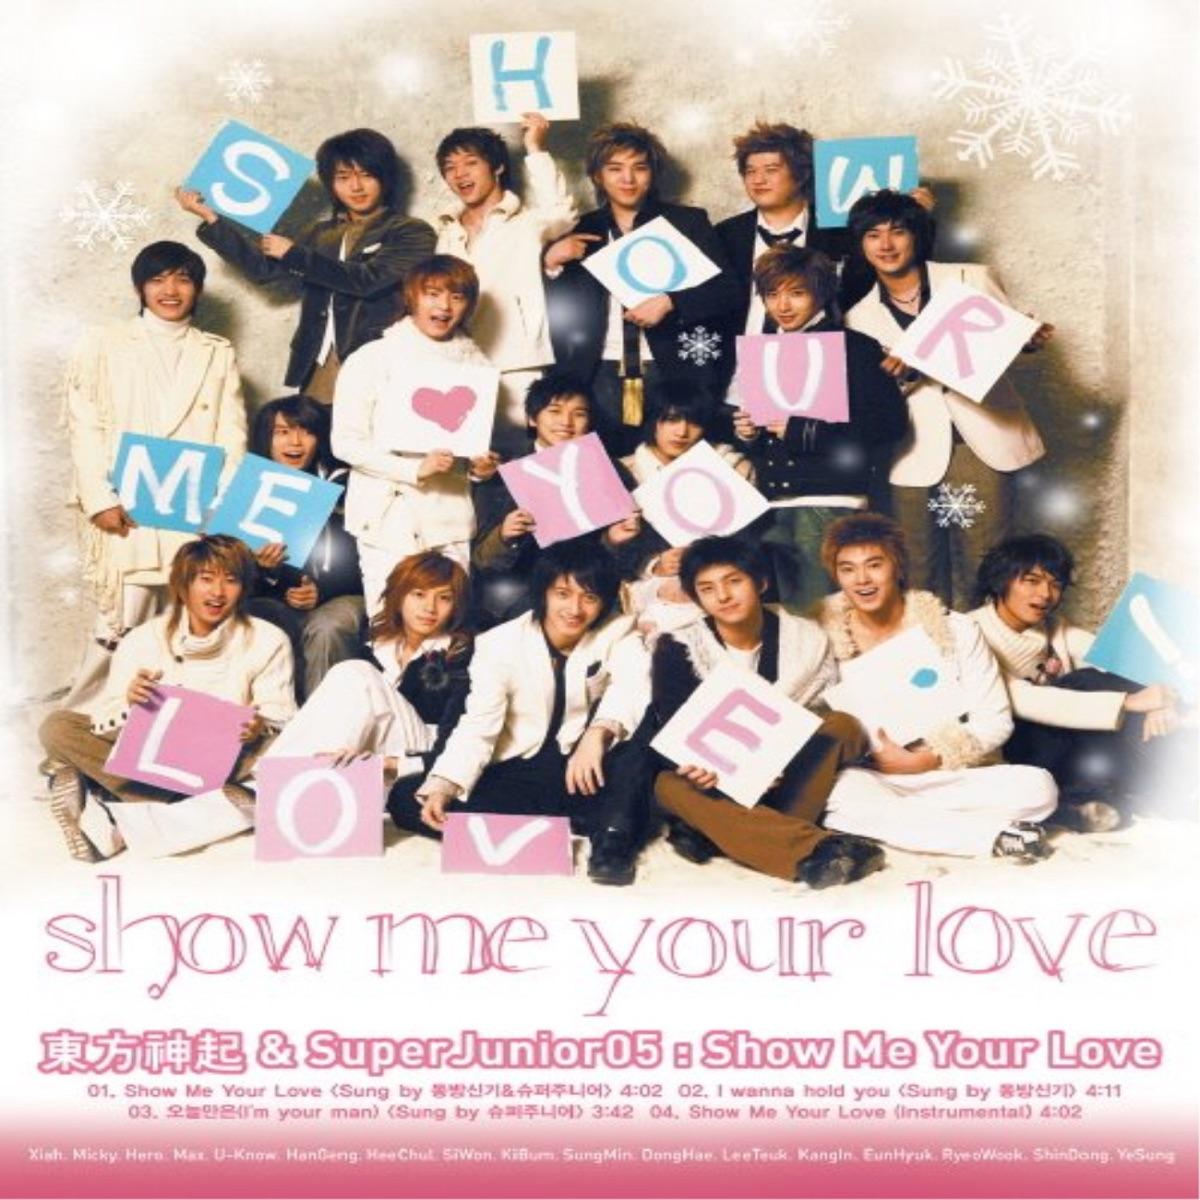 Show Me Your Love - Single Album Cover by SUPER JUNIOR & TVXQ!